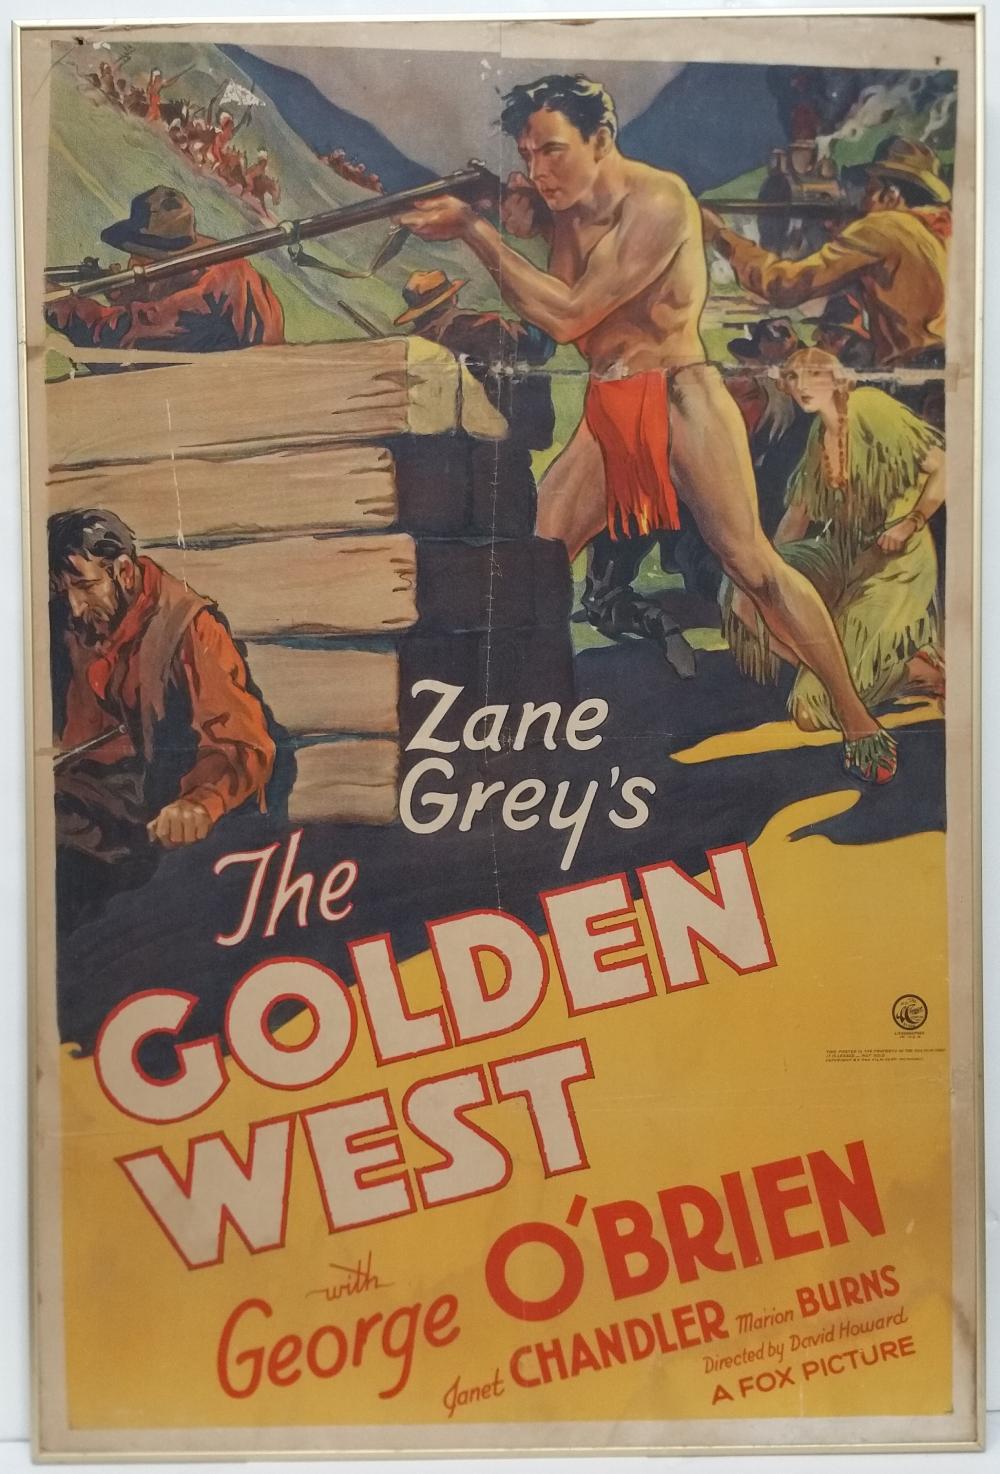 Original 1932 Golden West One Sheet Movie Poster Lithograph Estate Find David Howard Zane Grey George O'Brien Janet Chandler Marion Burns